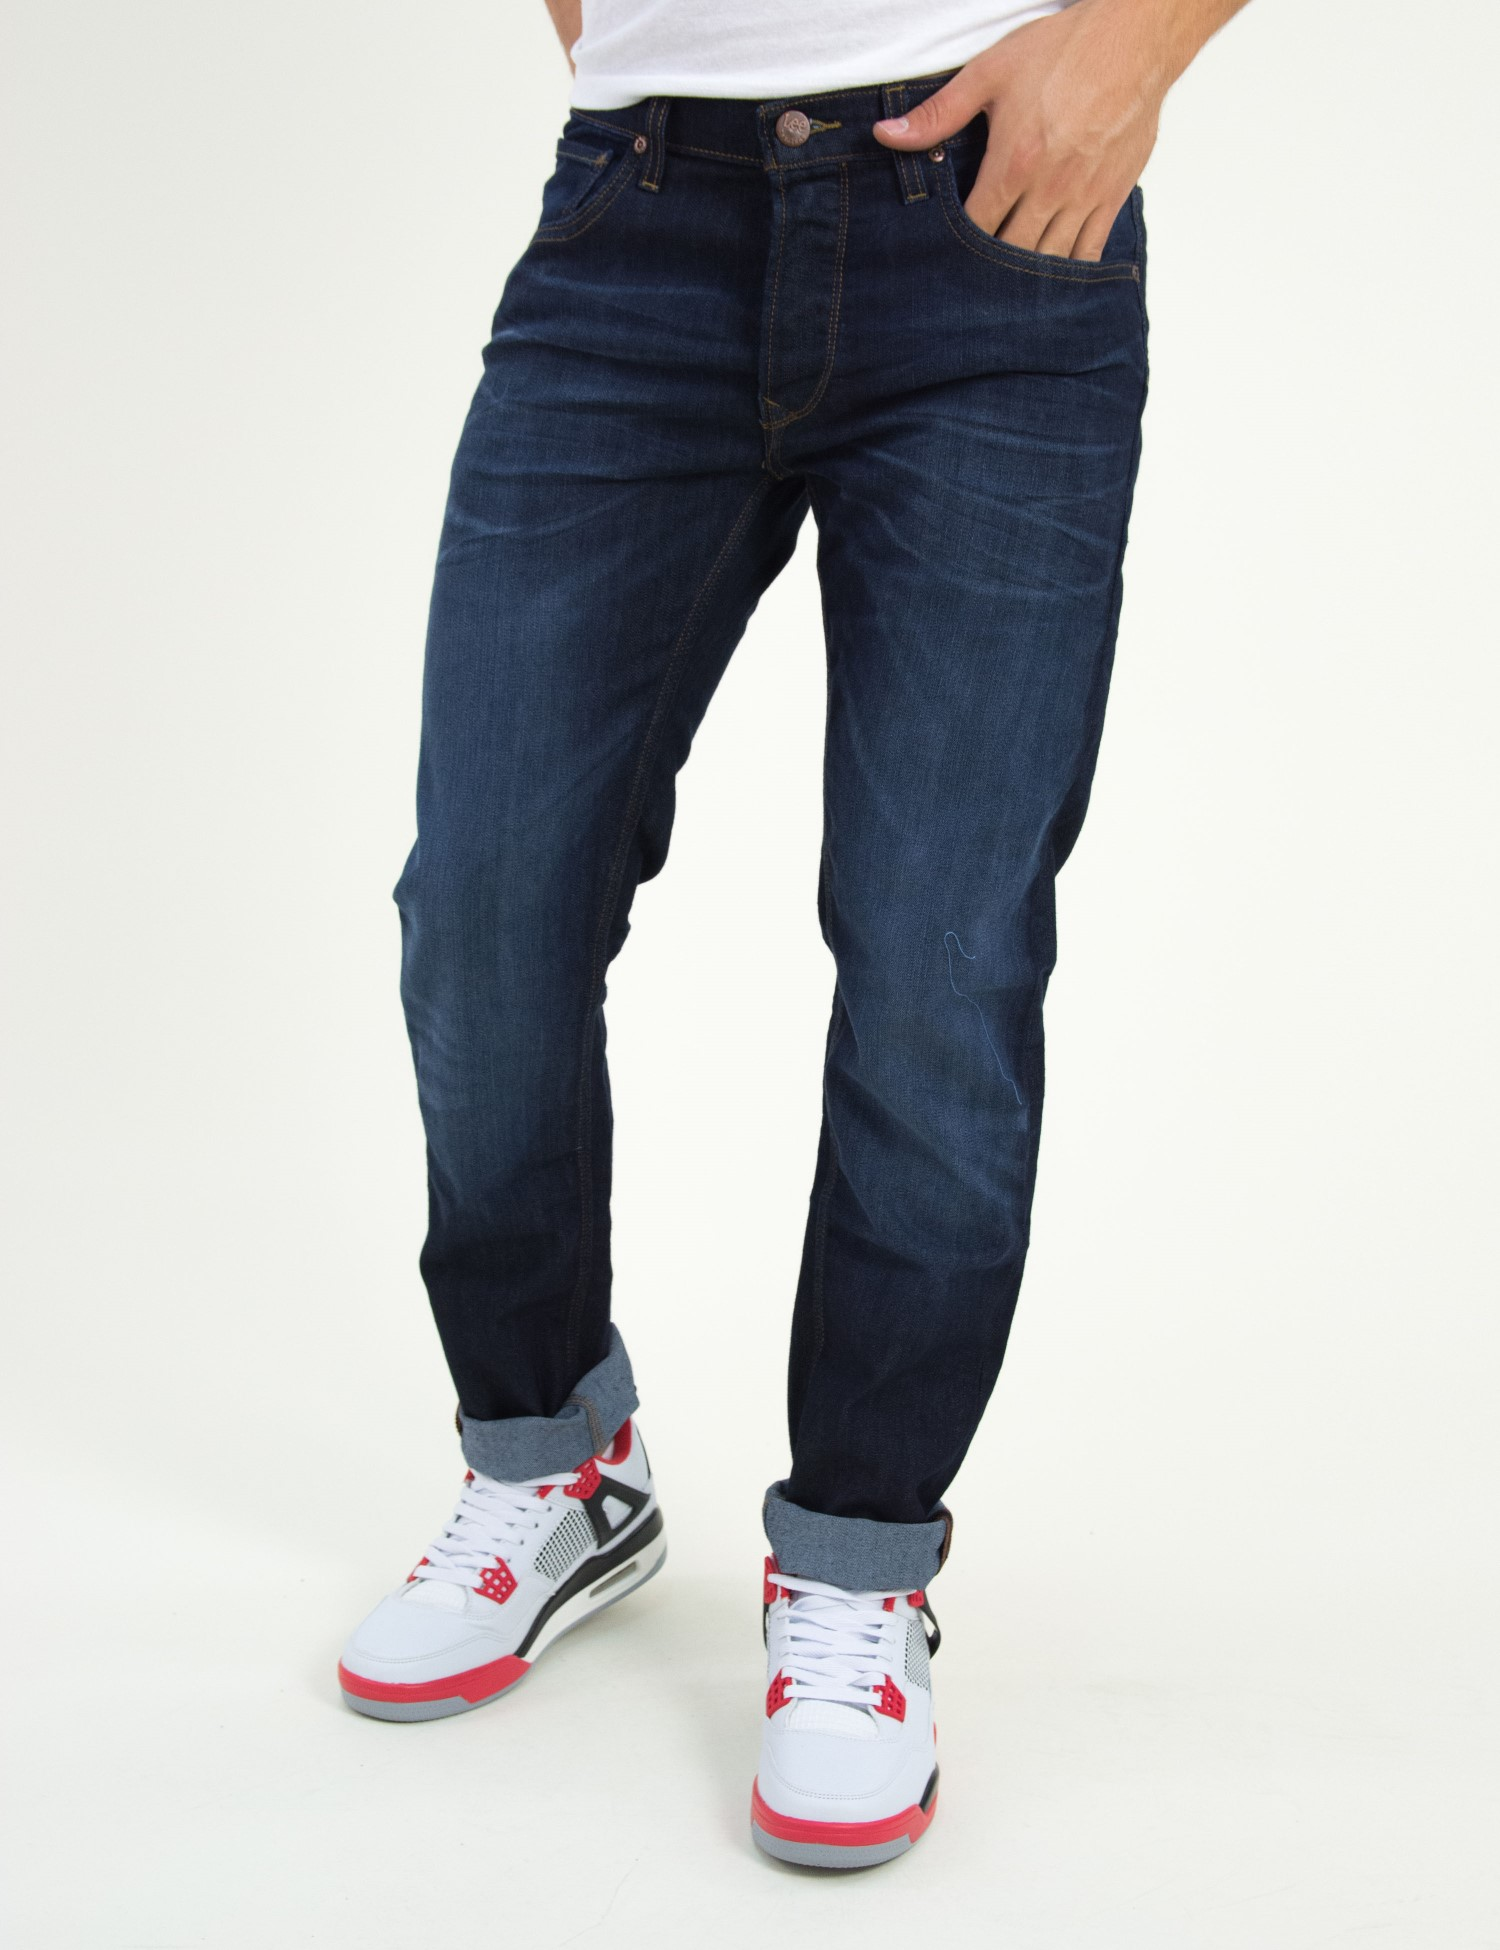 95109b50ef0d Ανδρικό τζιν παντελόνι Lee μπλέ σκούρο Daren L706AADB